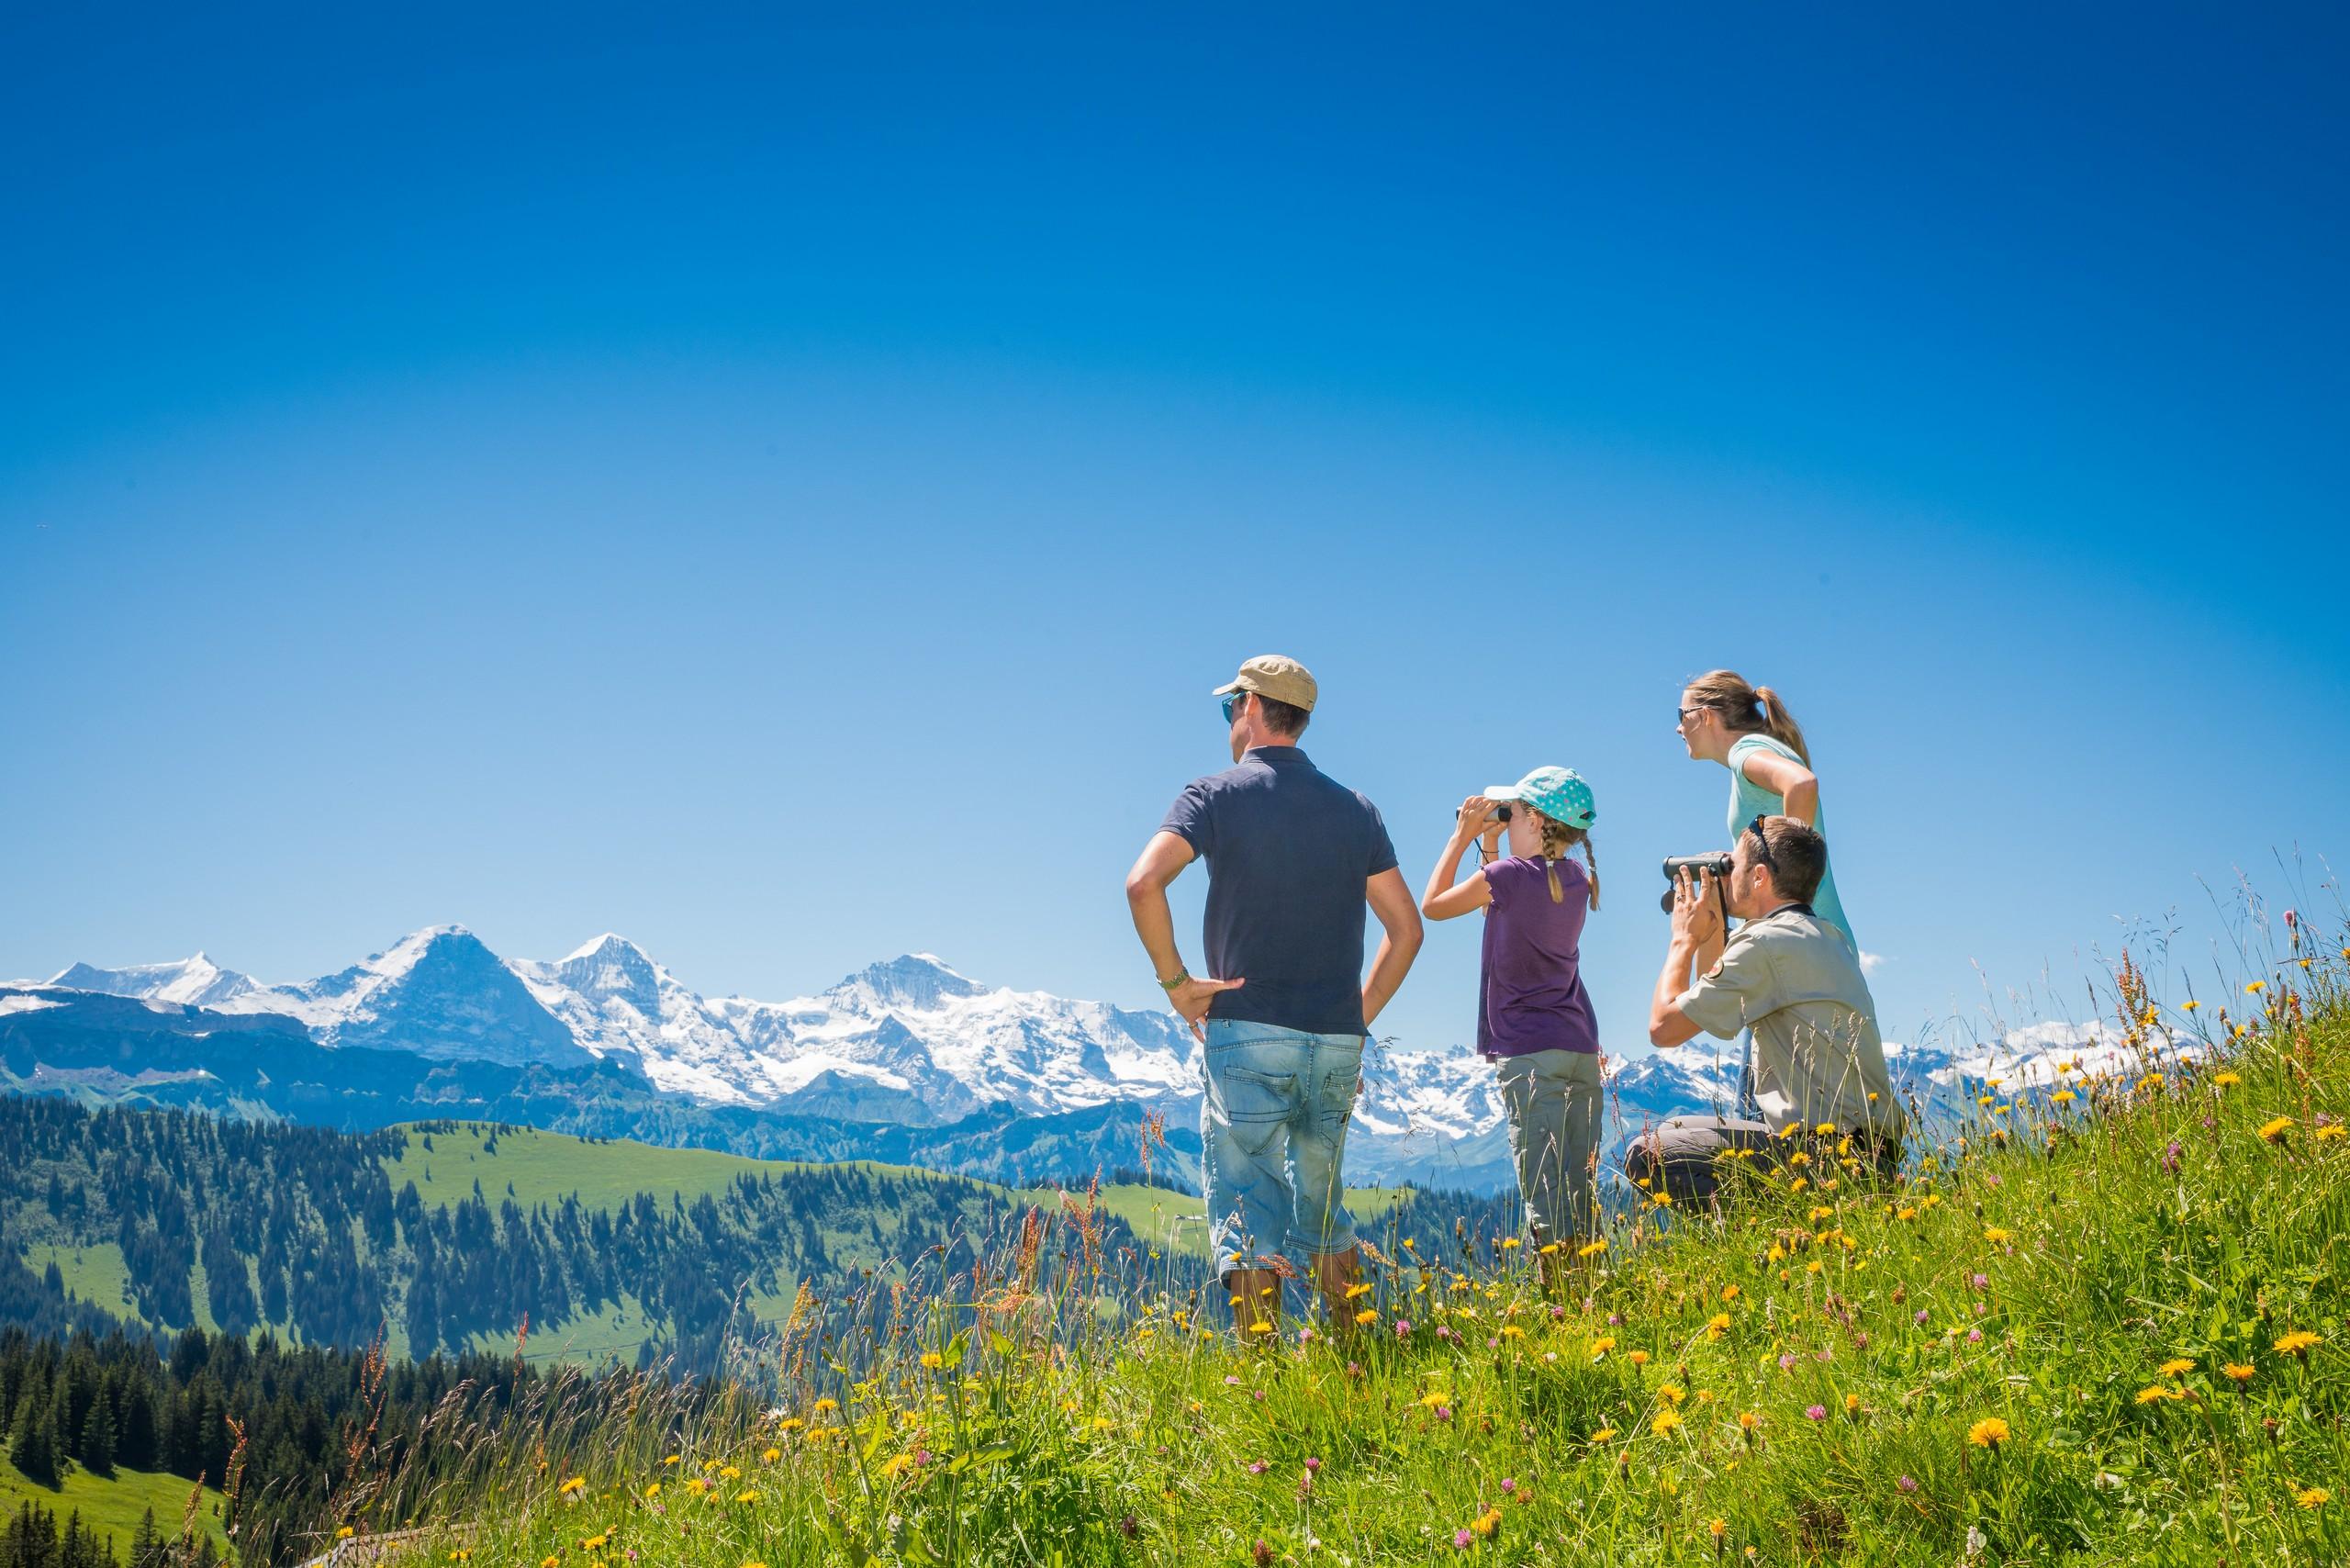 habkern-lombachalp-familie-wandern-sommer-feldstecher-panorama-familienaktivit-ten-themen-erlebniswege